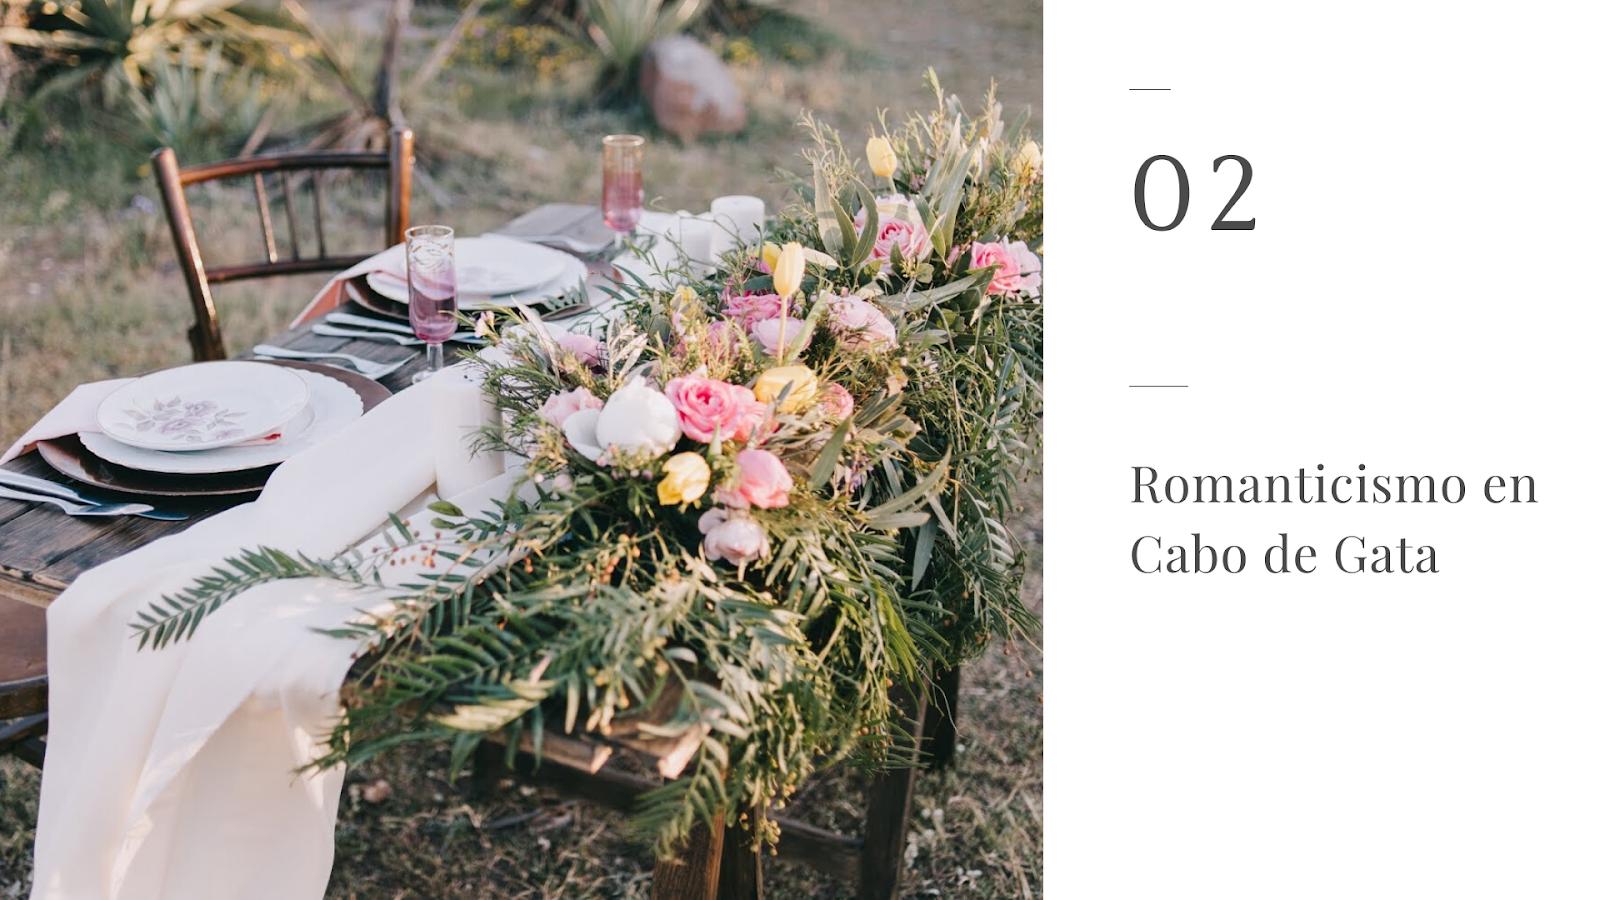 https://www.misecretosdeboda.es/2018/05/romanticismo-en-cabo-de-gata-almeria.html